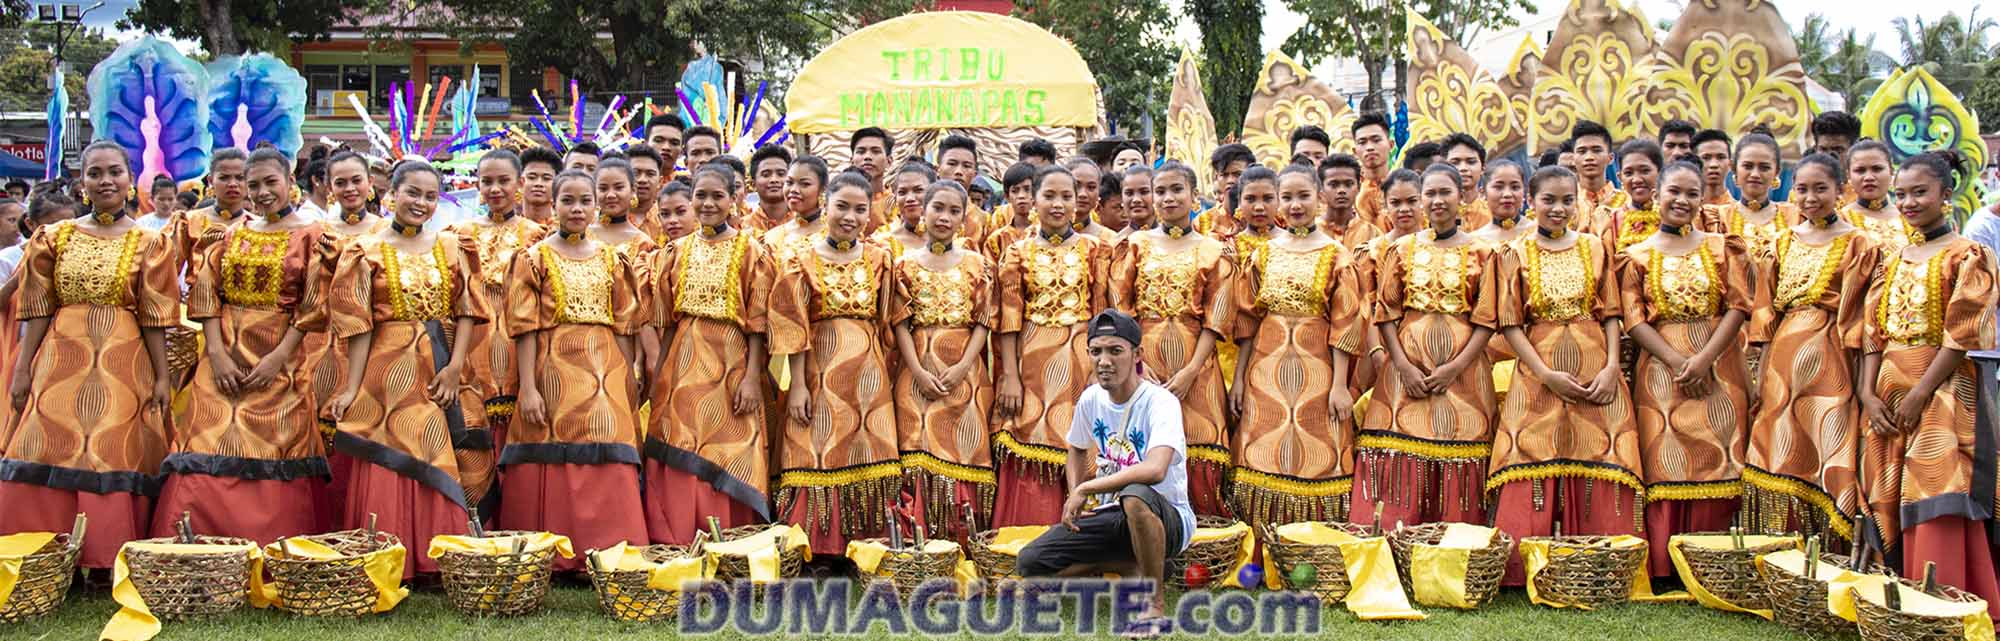 Hudyaka Festival 2018 in Bais City - Tapasayaw Festival 2018